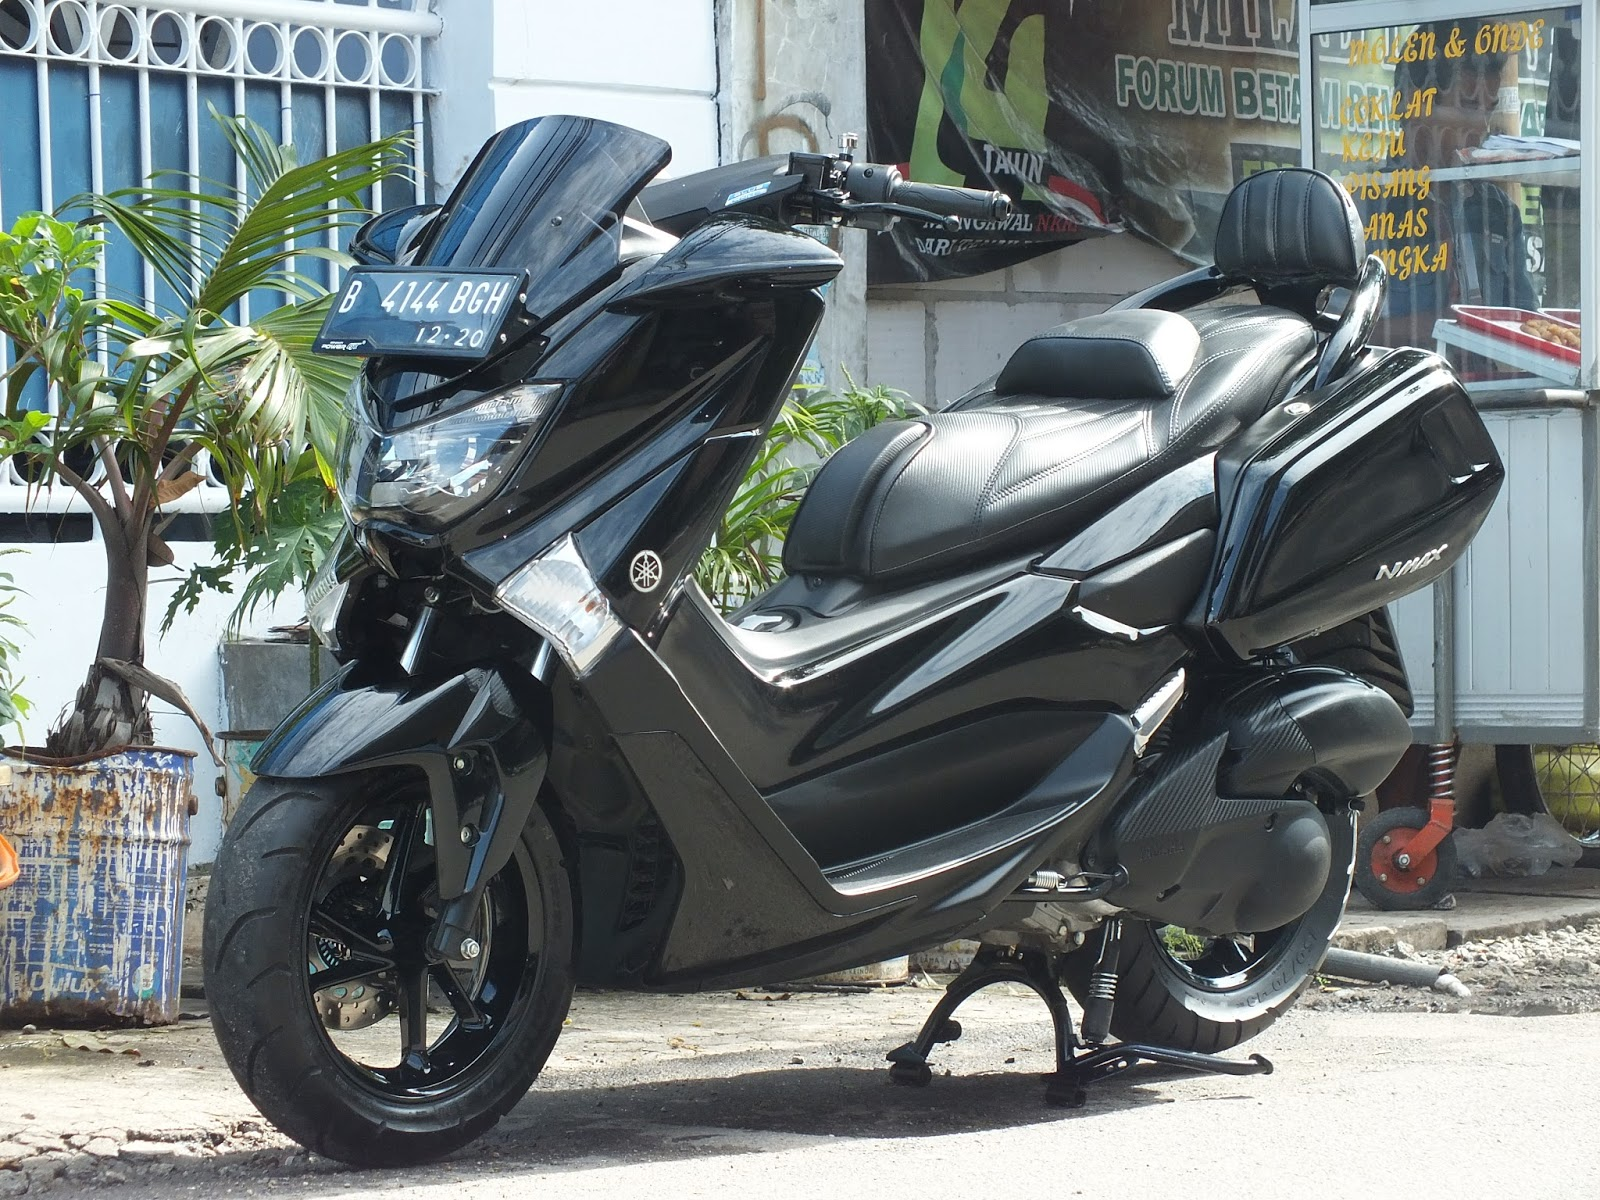 Kumpulan 69 Modif Yamaha Nmax Hitam Doff Terbaik Kempoul Motor